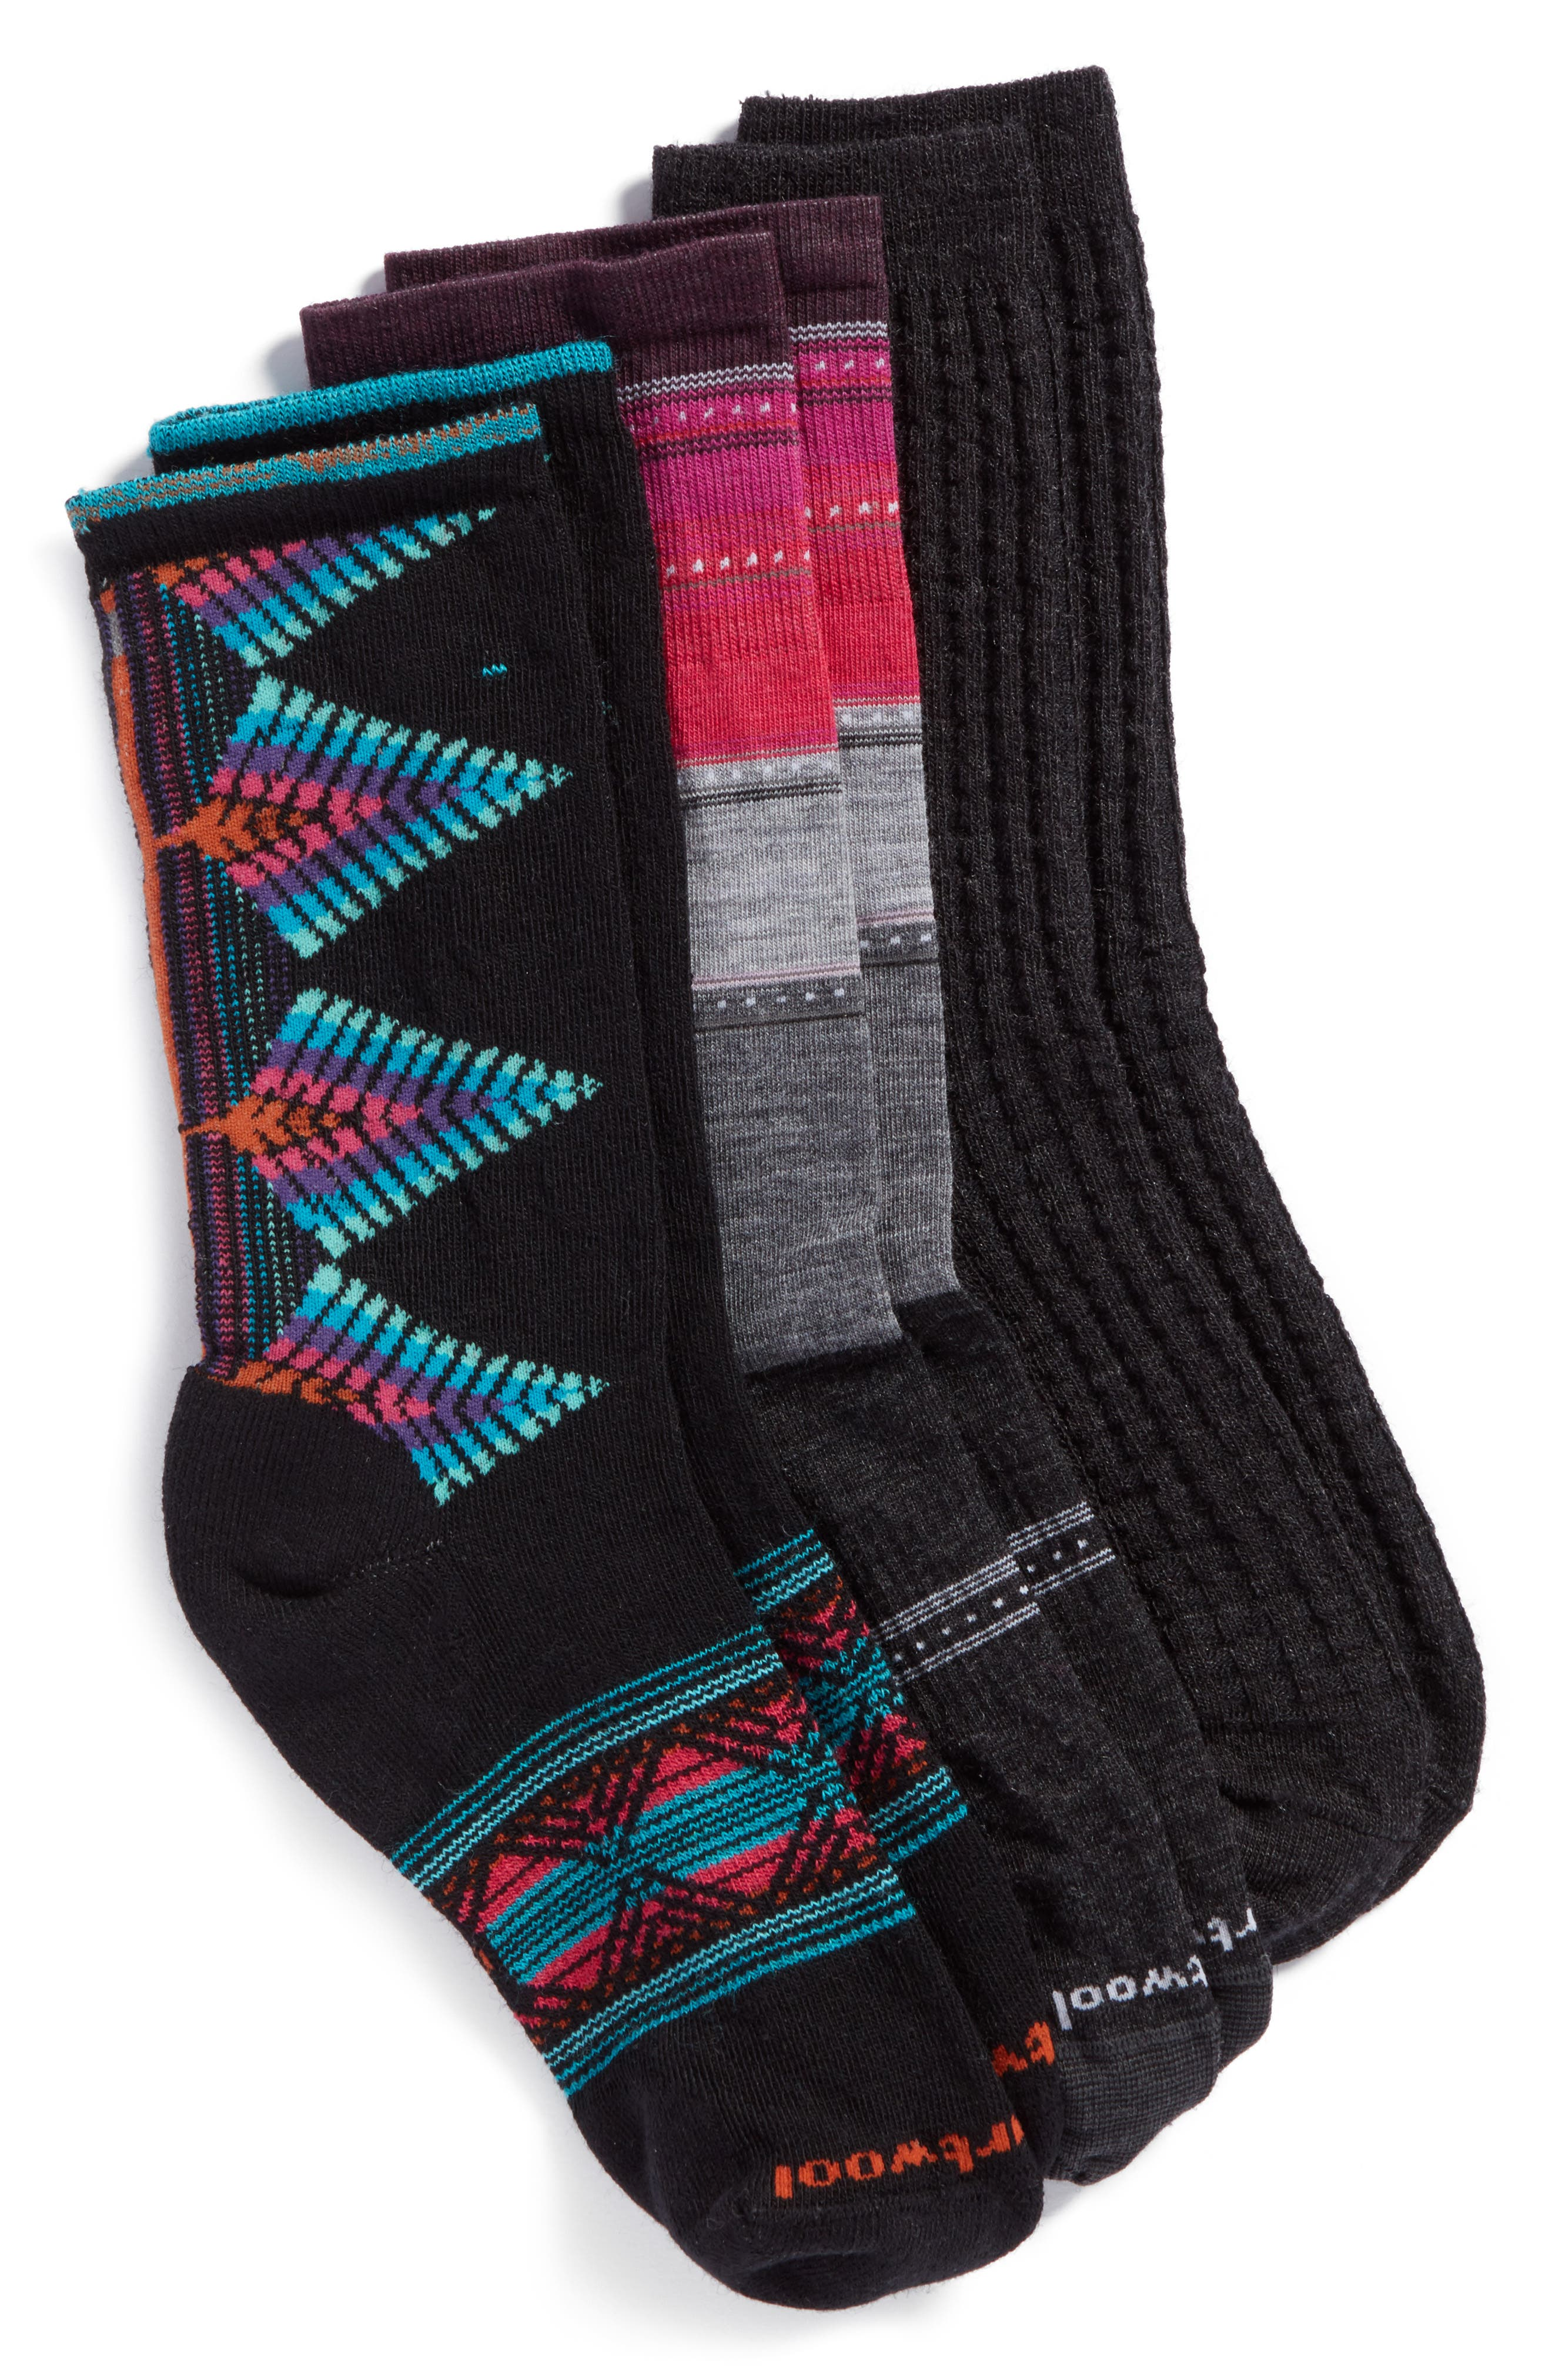 Smartwool 3-Pack Crew Socks